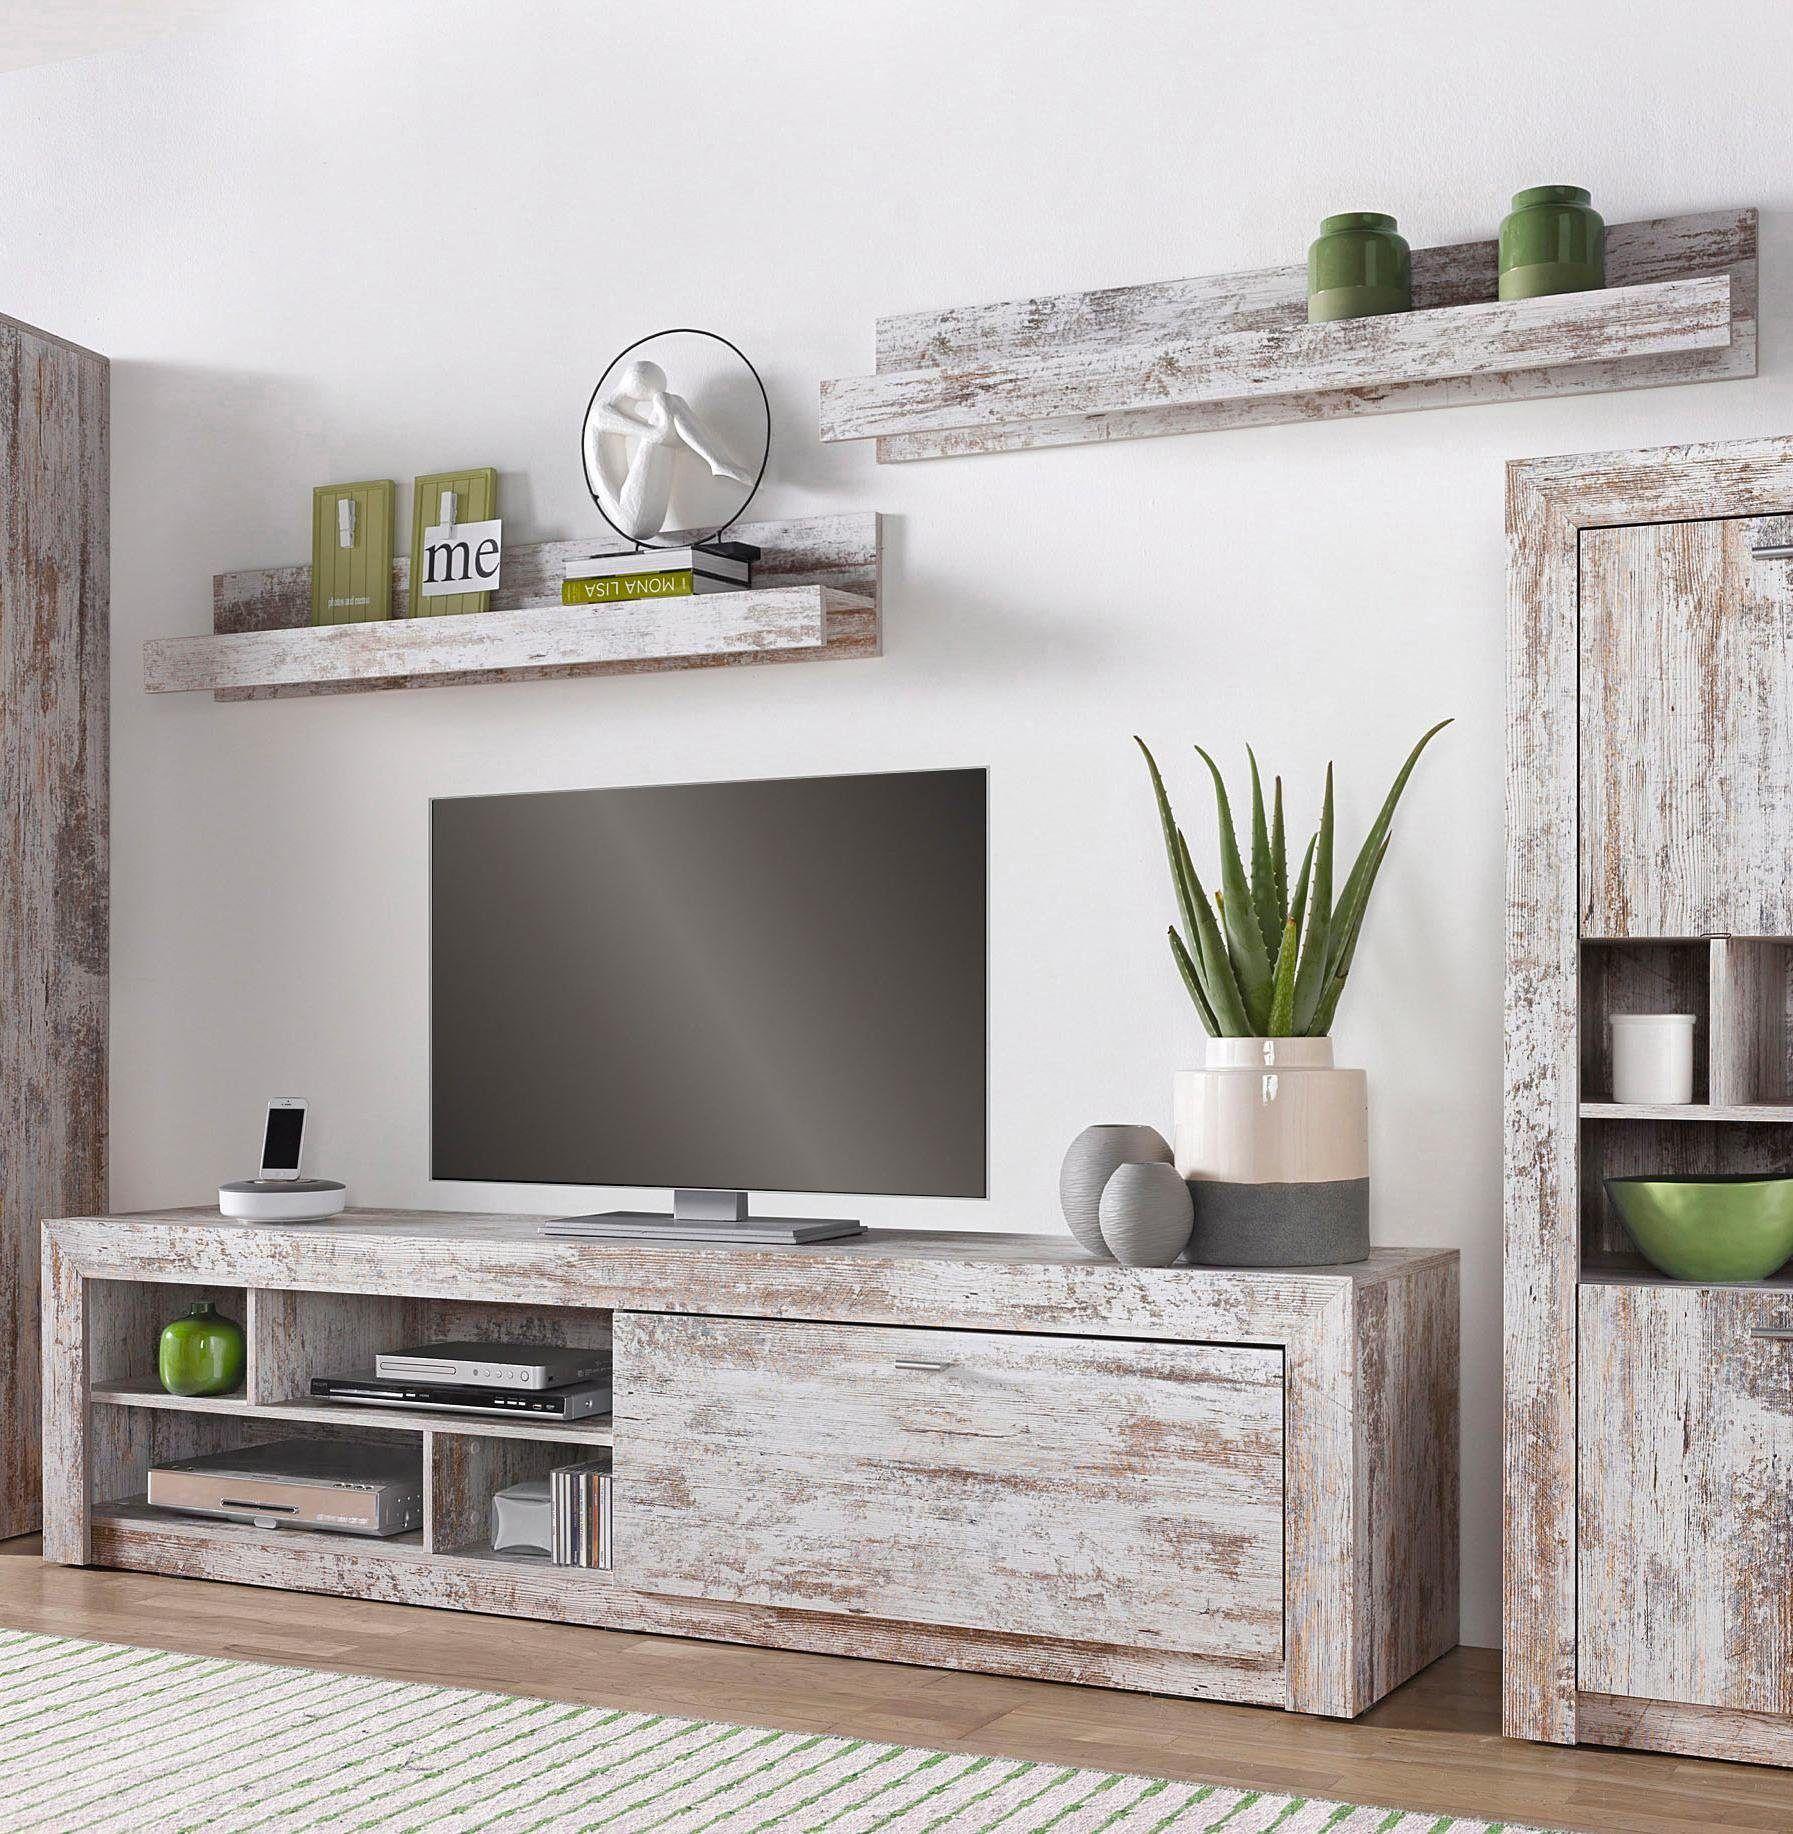 wandregale grau latest wandregale grau with wandregale grau great platte fr wandregal grau. Black Bedroom Furniture Sets. Home Design Ideas